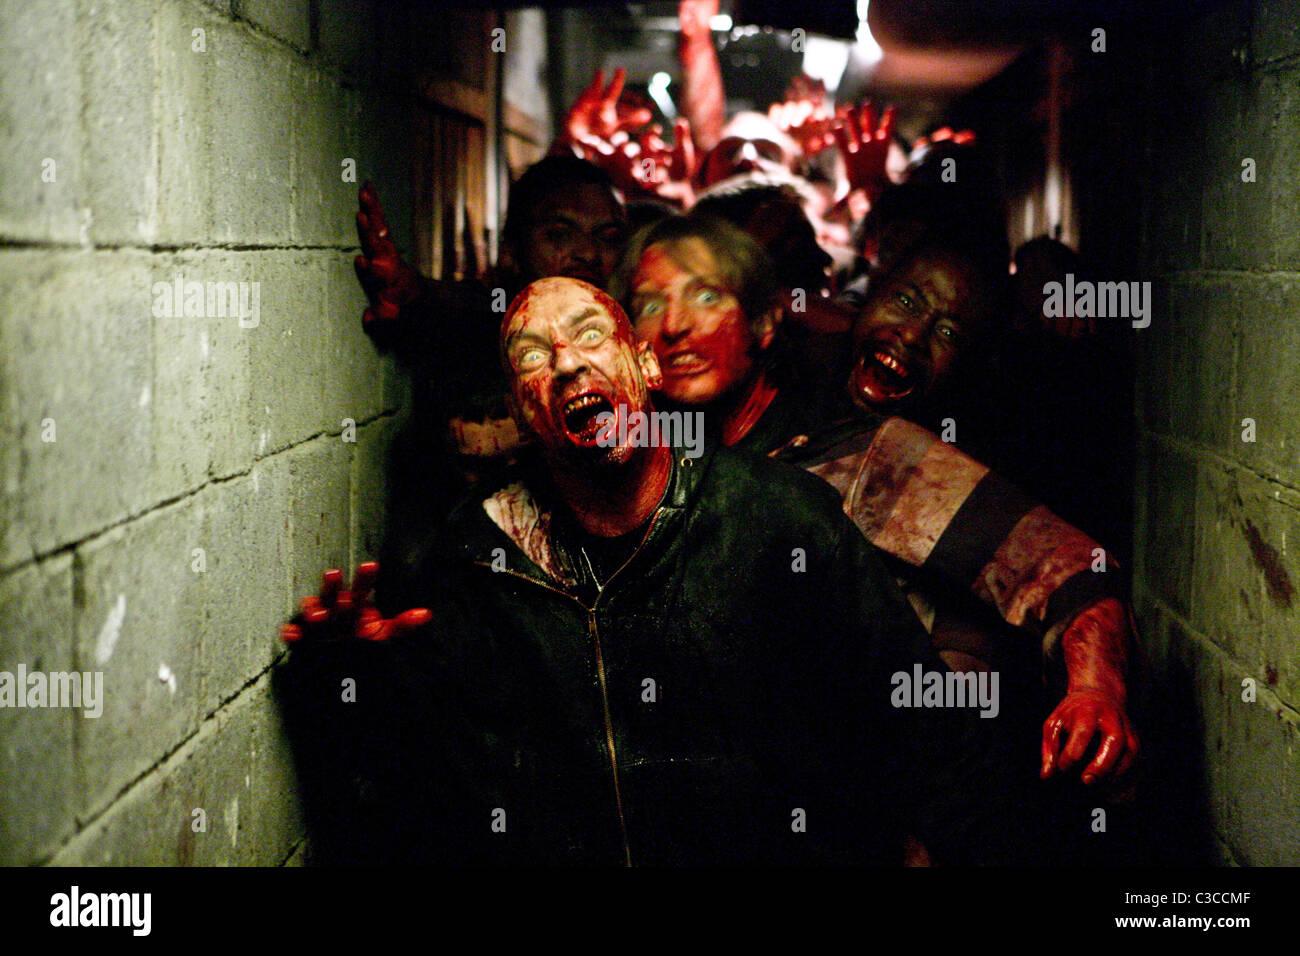 ZOMBIE SCENE THE HORDE (2009) - Stock Image